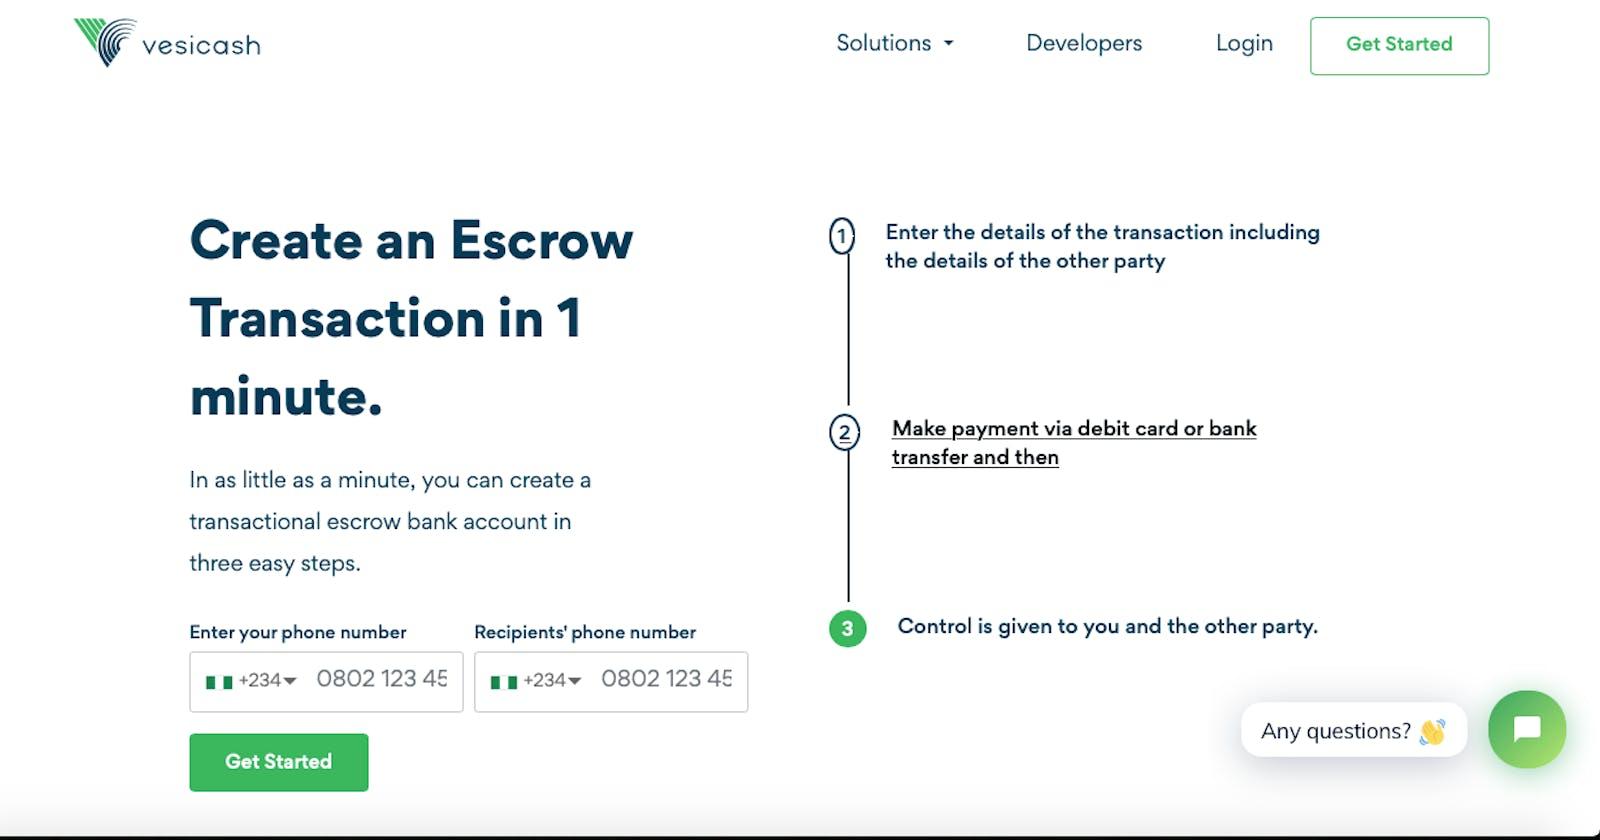 Securing P2P Transactions Using Vesicash Instant Escrow.